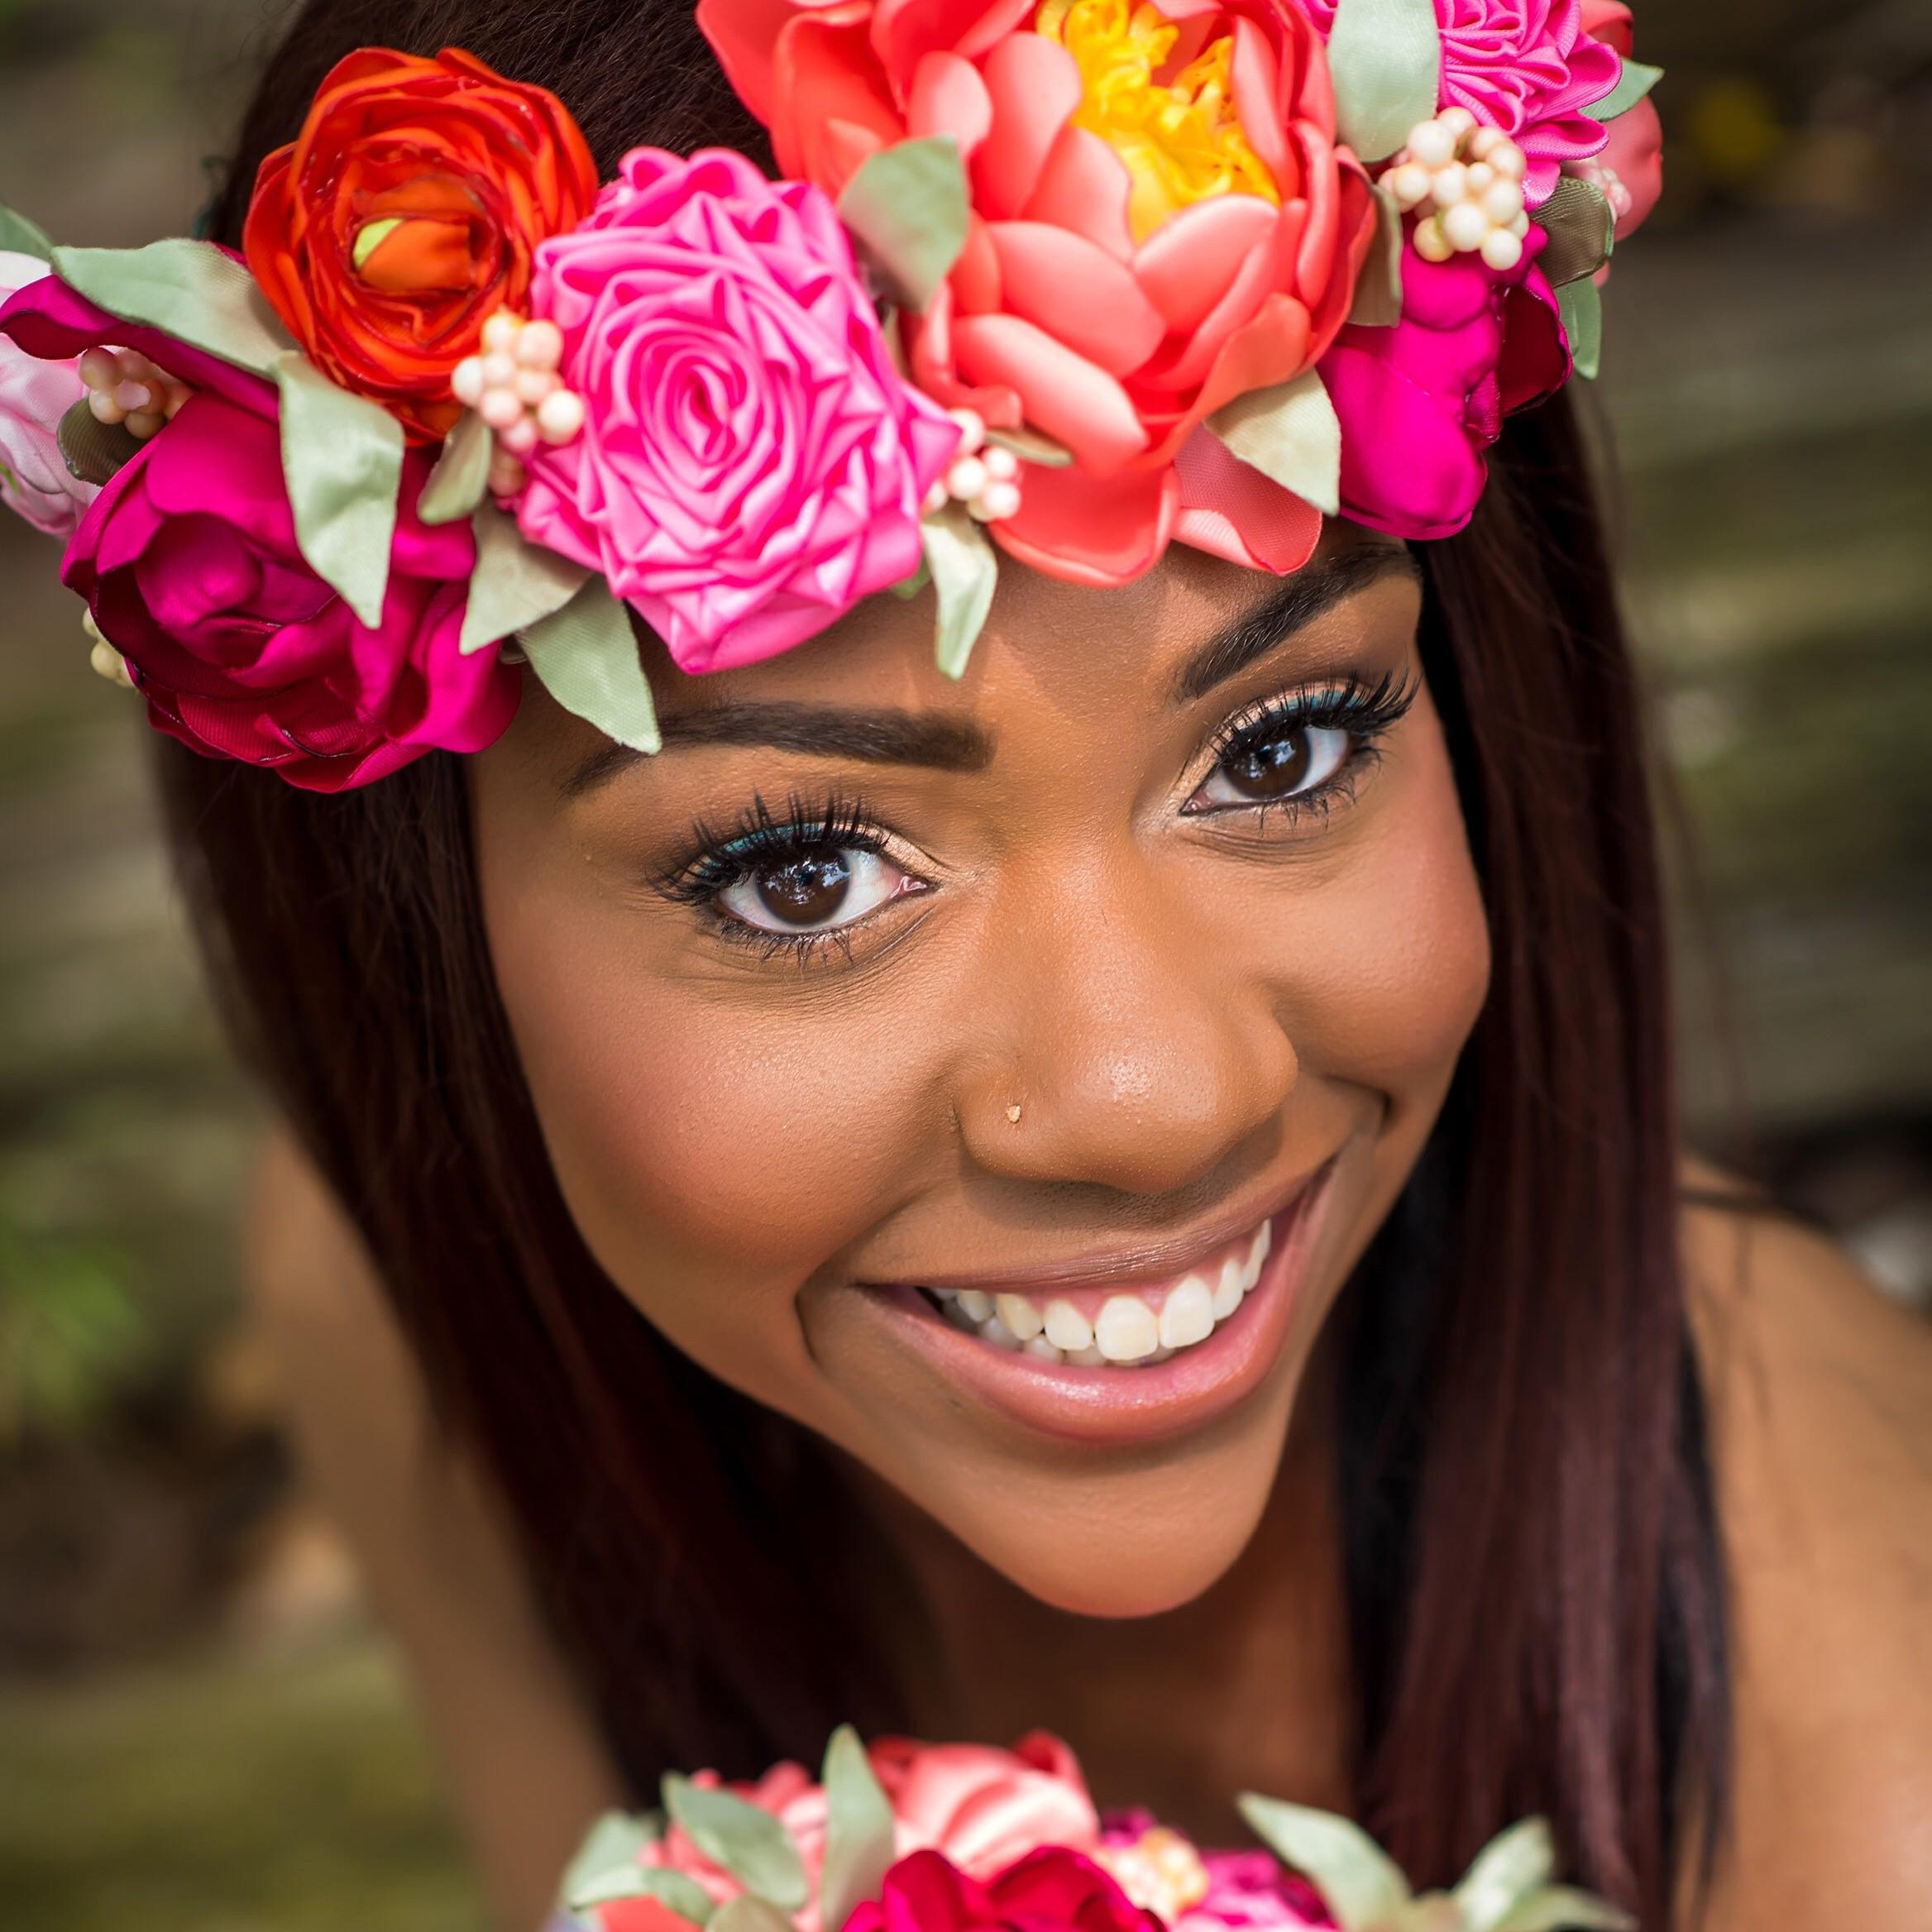 Makeup Artist:  Emma Anyanwu  Photography:  Alakija Photography Studio  Headpiece:  To Hold & To Have  ( The Bride List  Preferred Vendor)